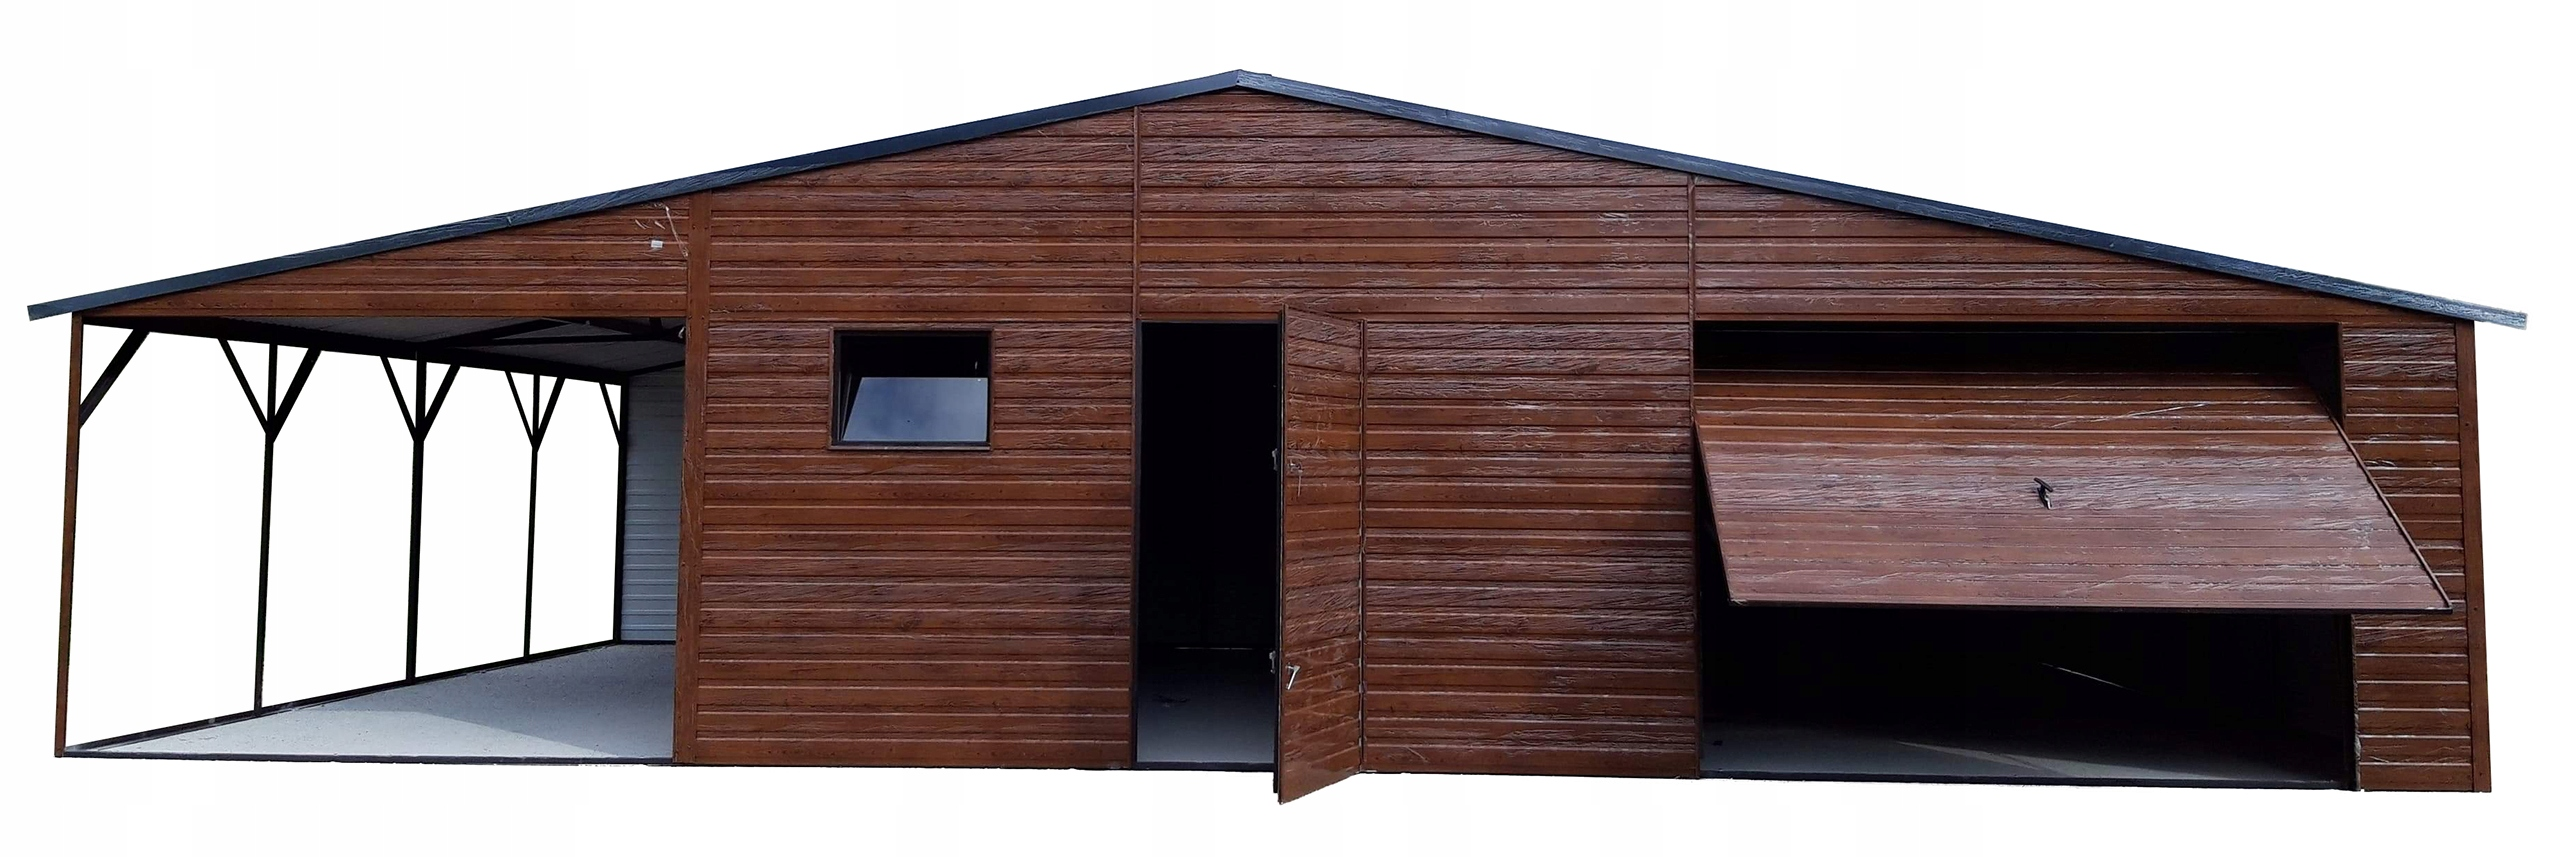 Tin Garage Hala Shed Walnut 8 + окно ворот 3x7